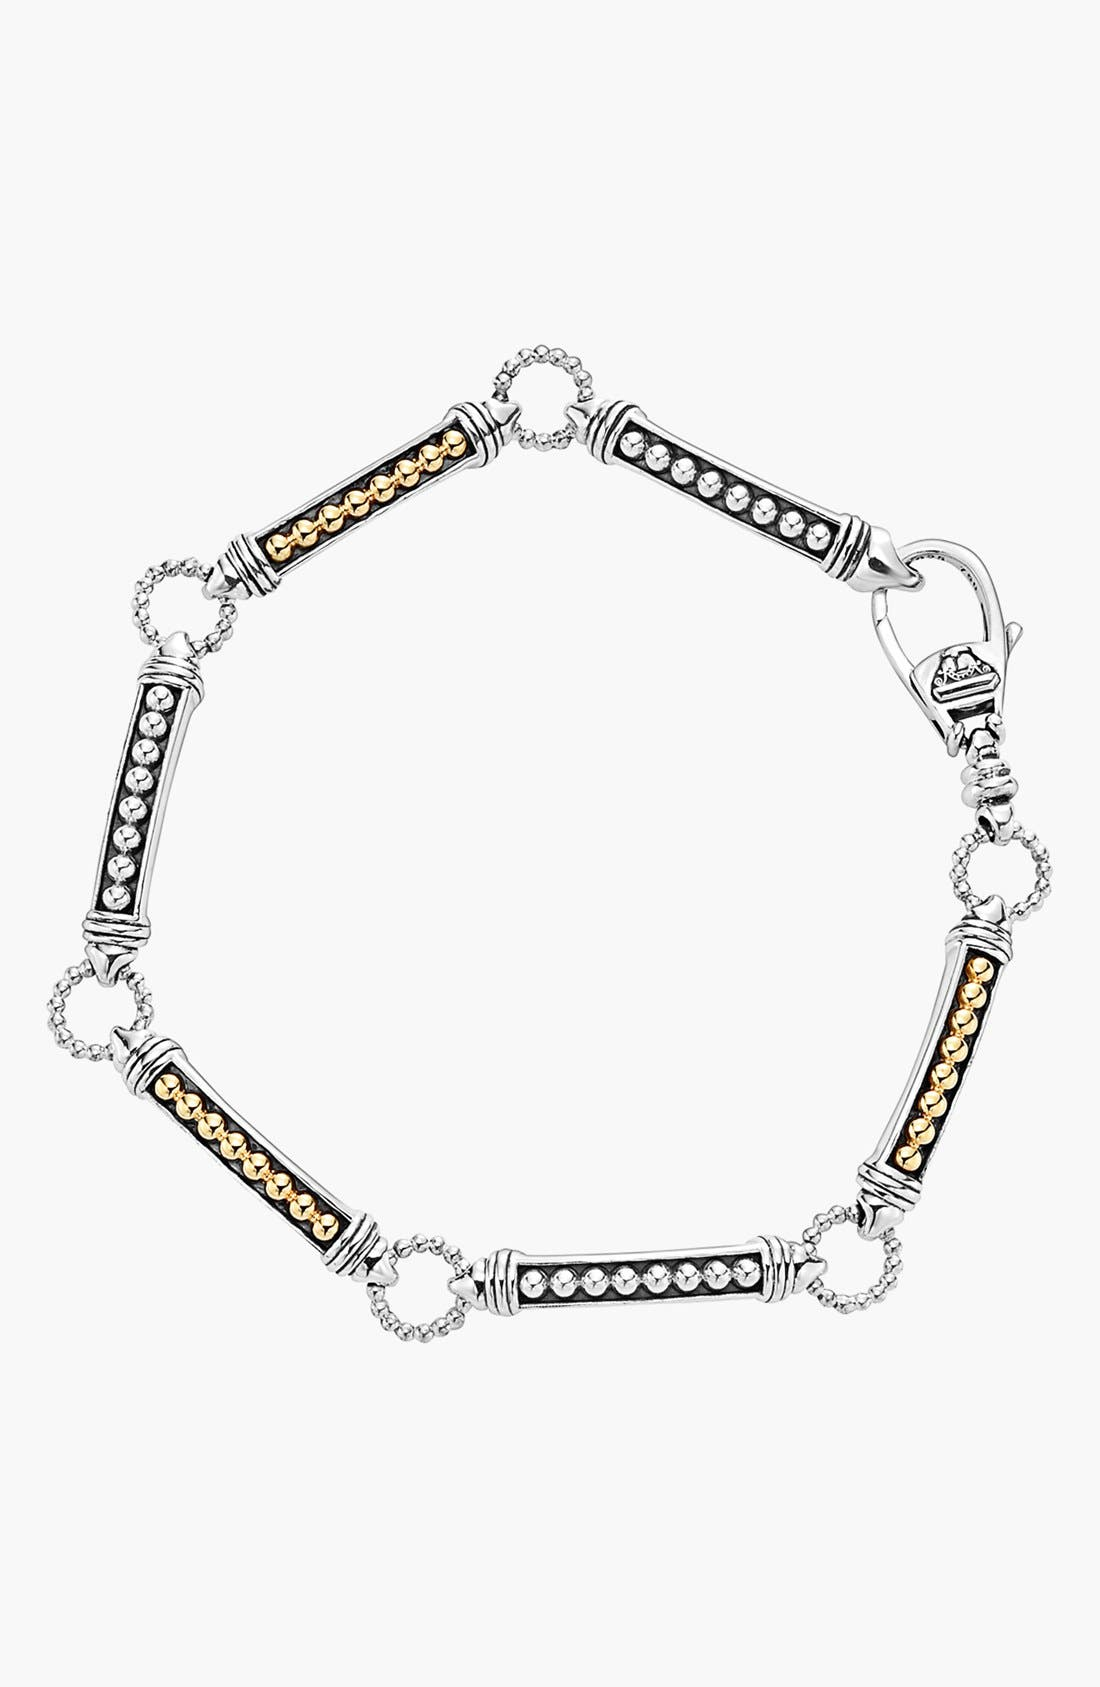 Caviar 'Superfine' Two-Tone Line Bracelet,                             Alternate thumbnail 6, color,                             040